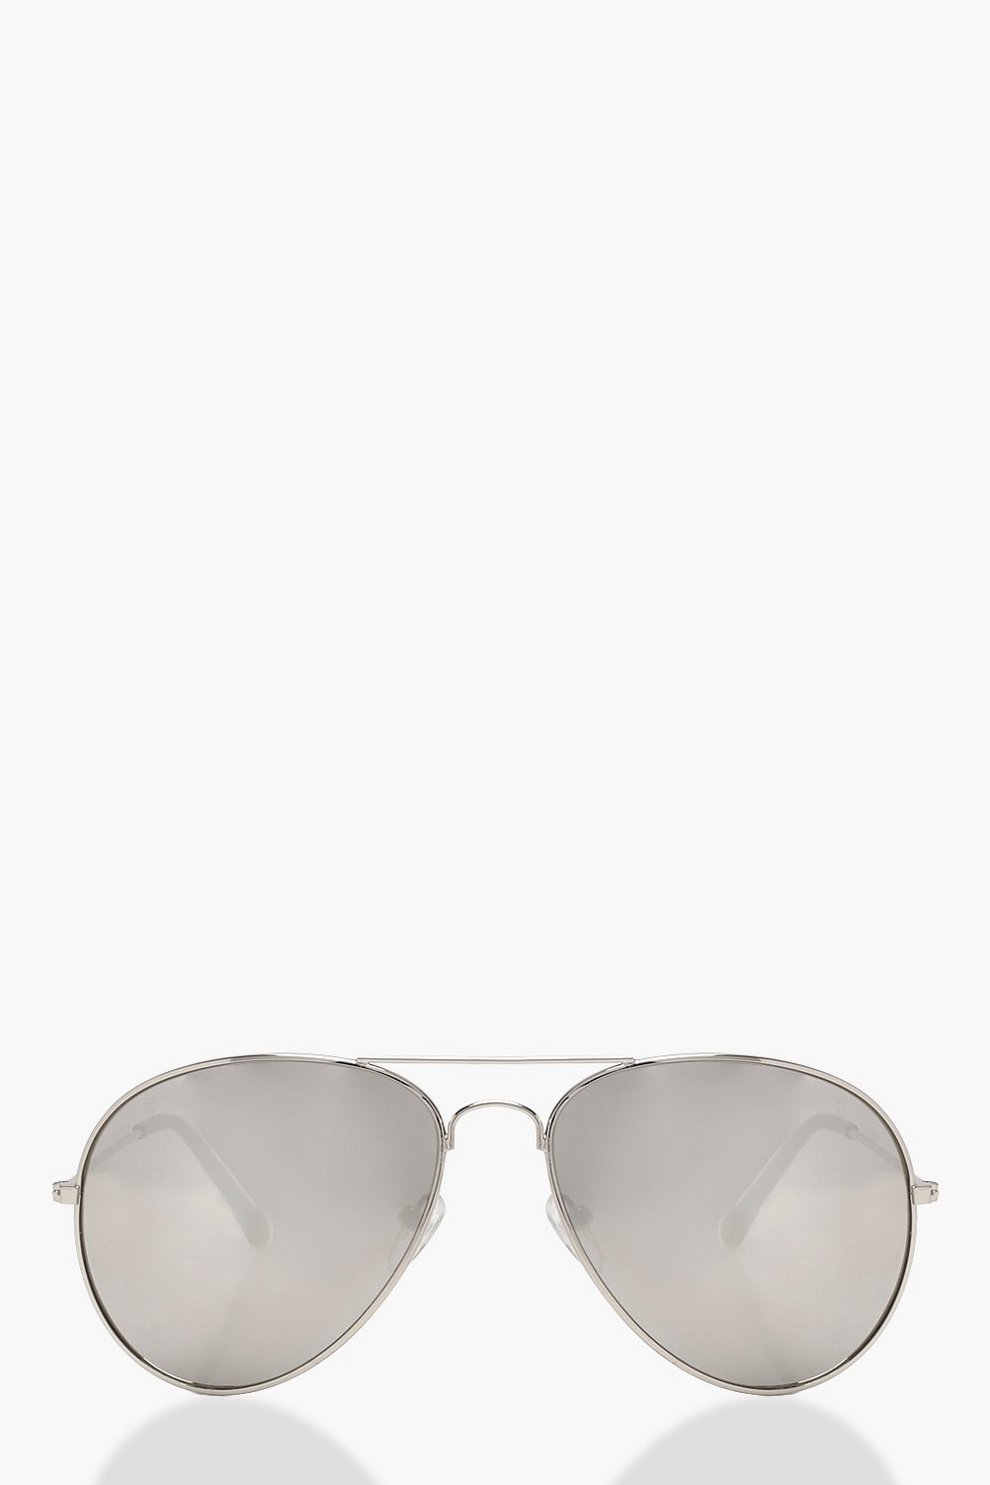 Occhiali Aviatore Con Da Sole Stile Lenti FumèBoohoo In QWErdxoeCB